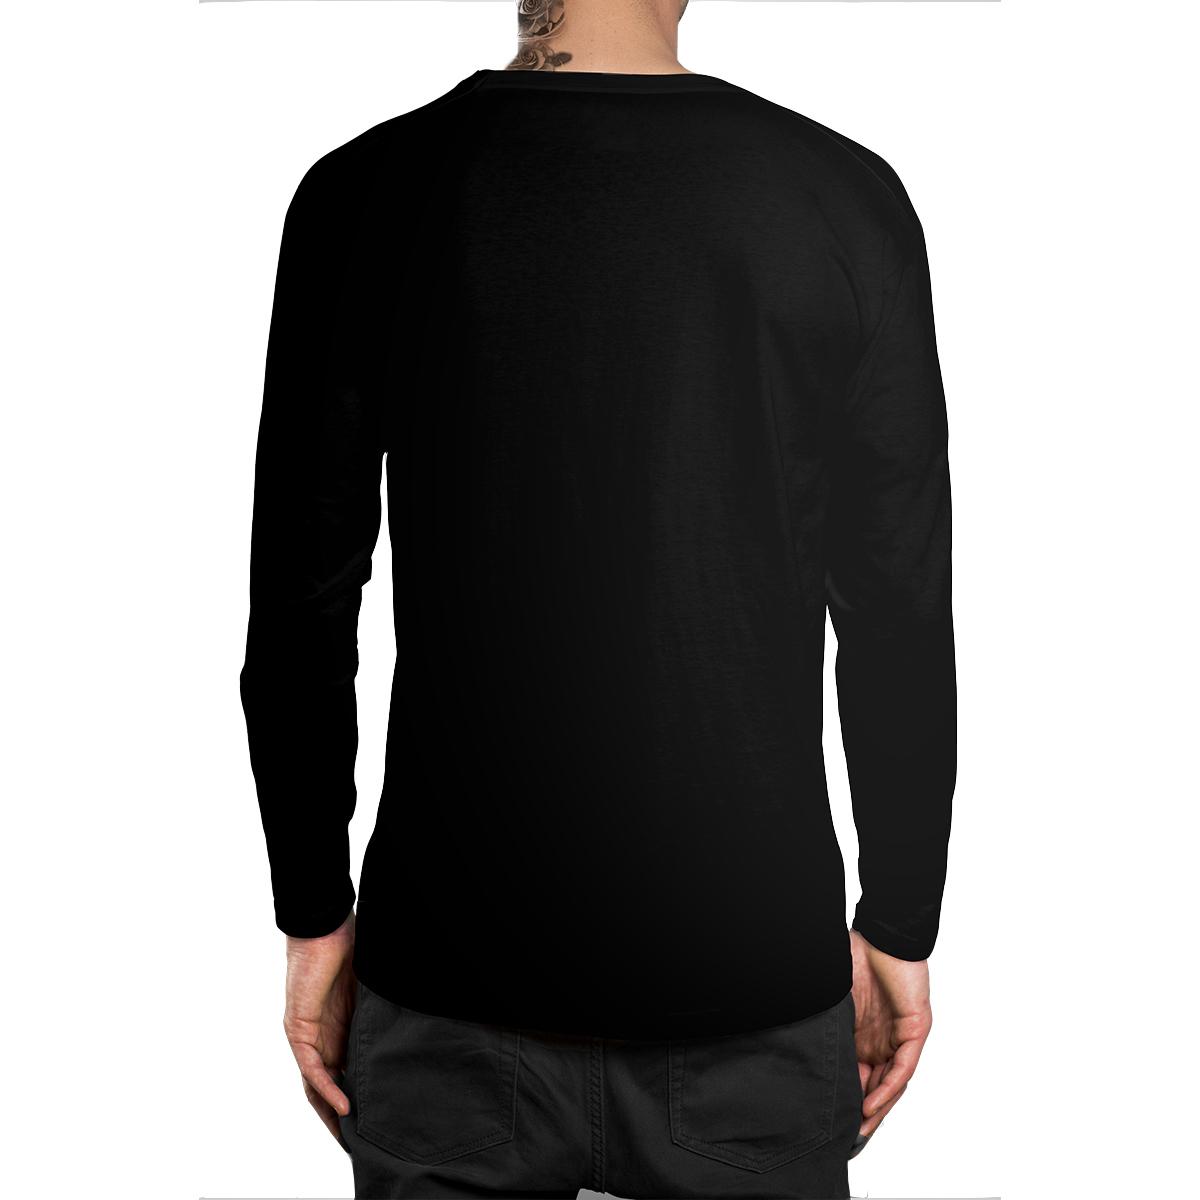 Stompy Camiseta Manga Longa Modelo 15